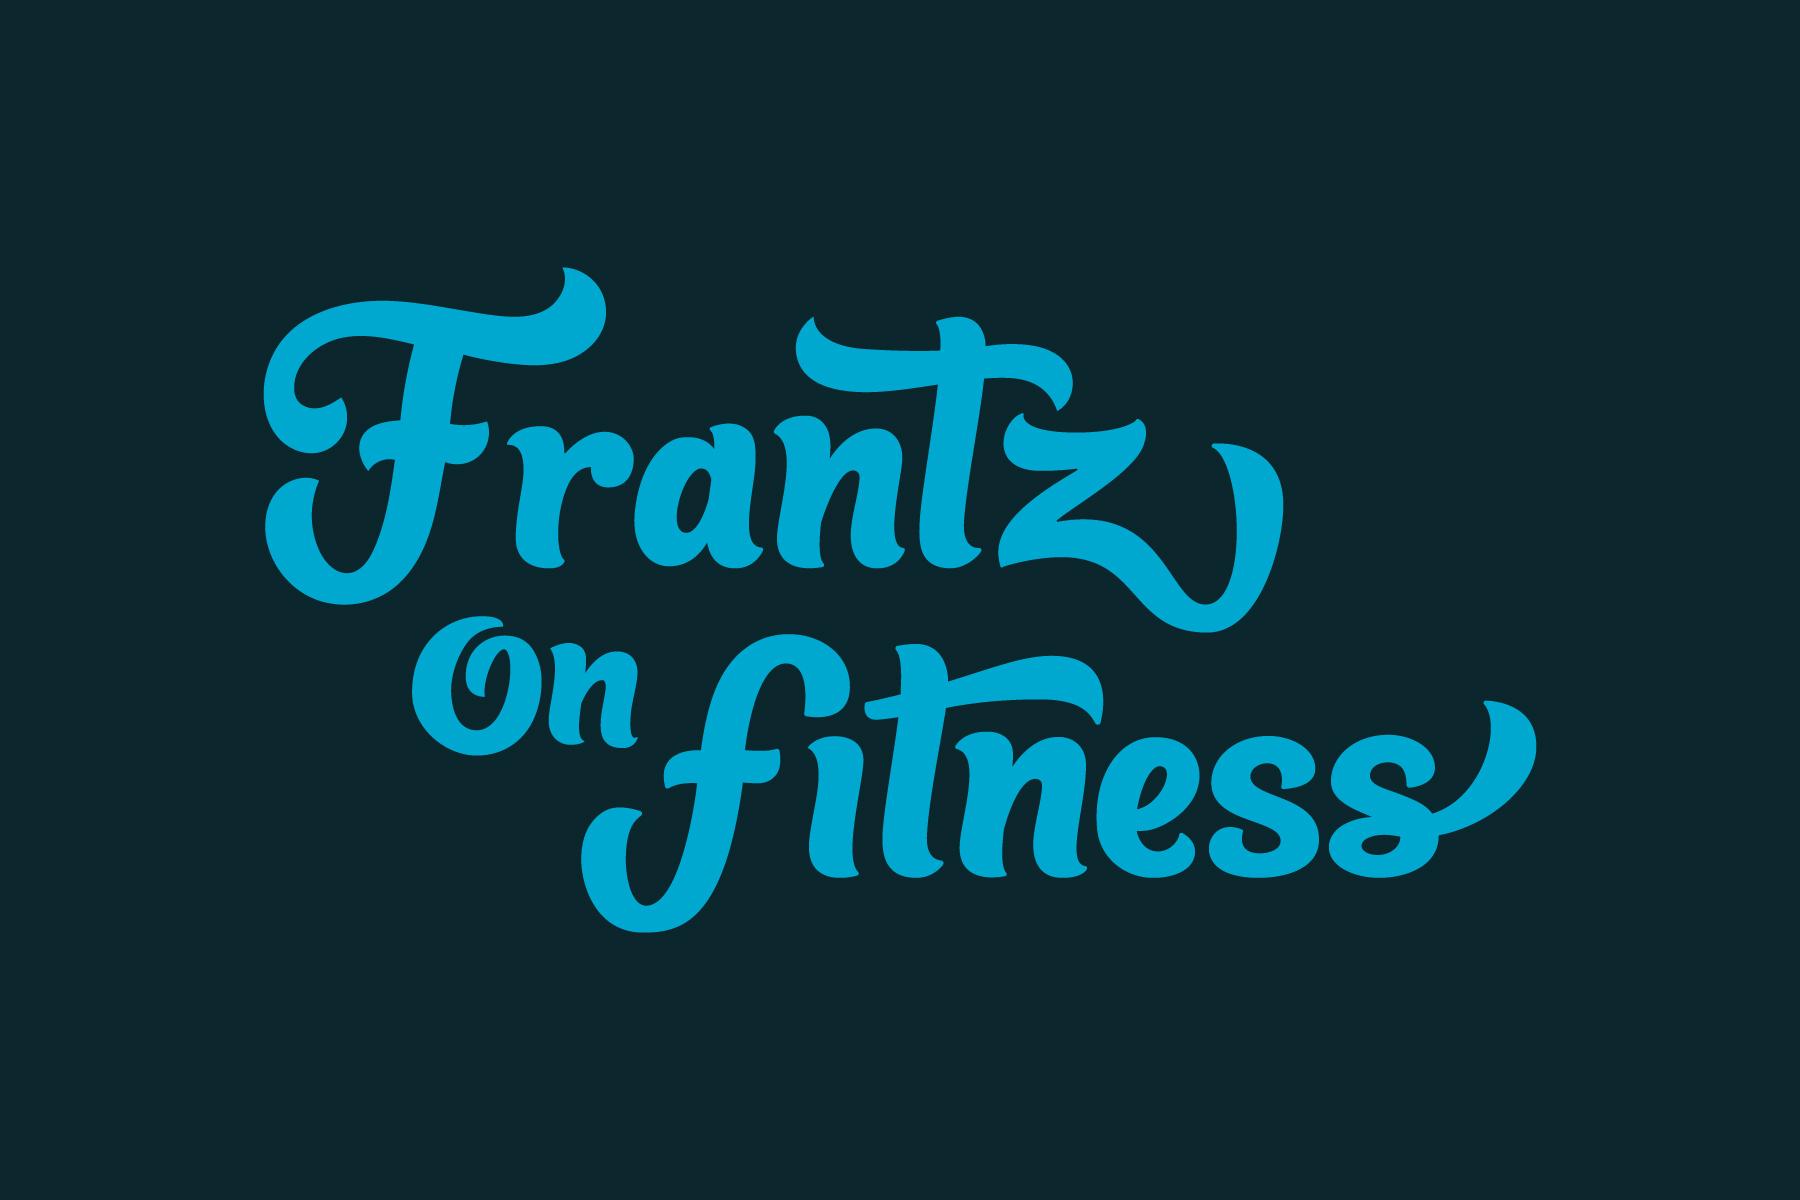 frantz-on-fitness-logo-design-lettering-leo-gomez-studio-03